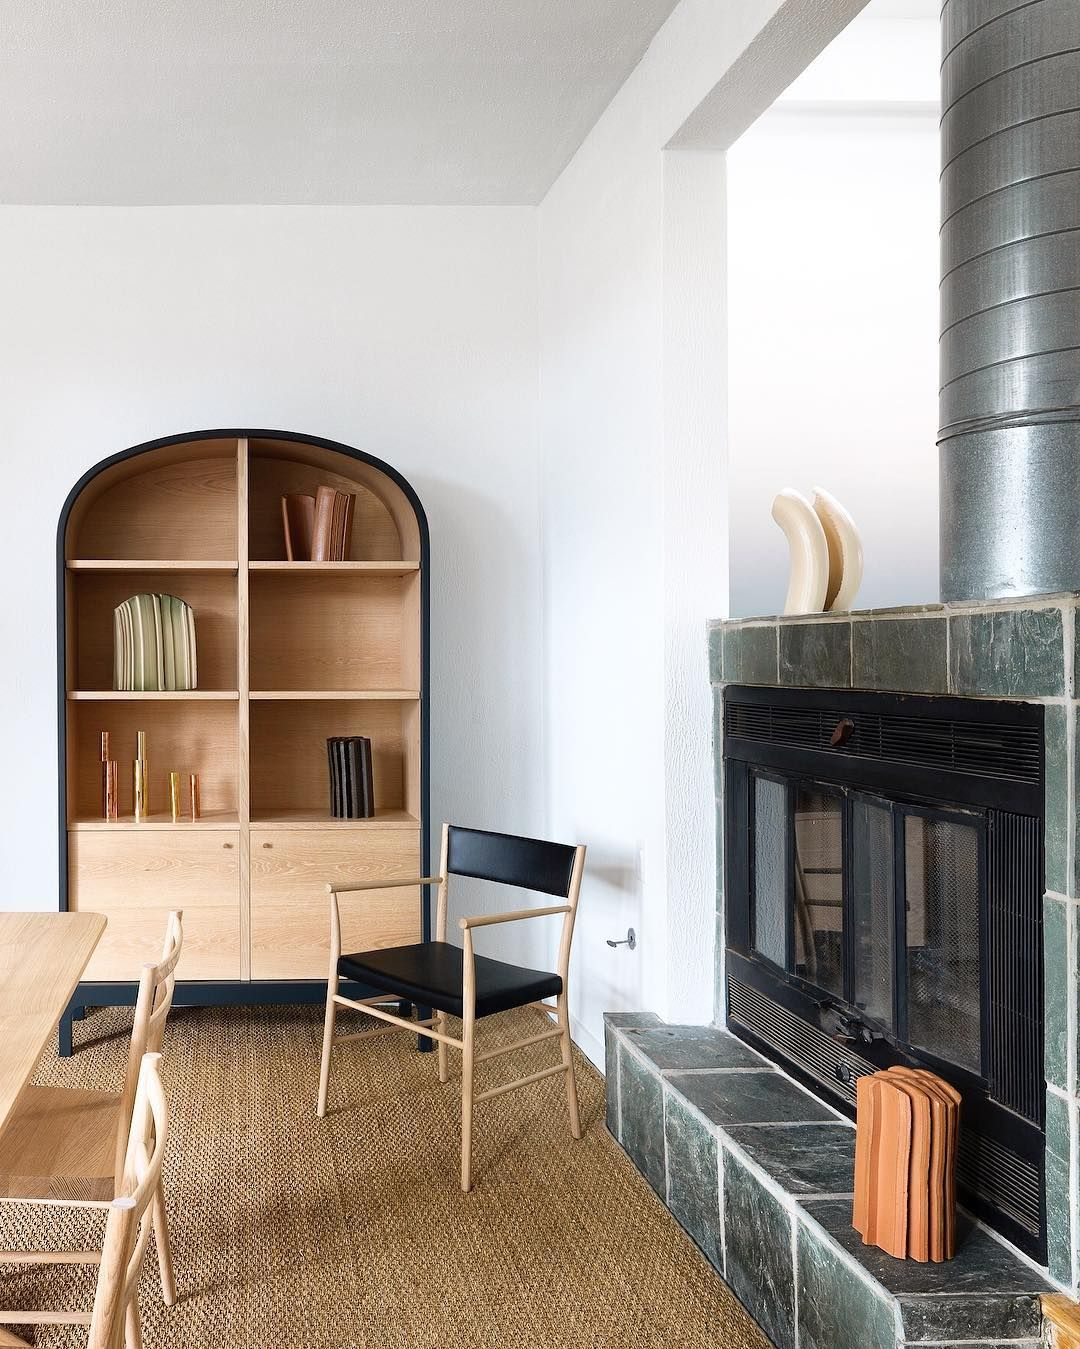 San Fransisco Apartment: @thefutureperfect X @pinch_london's San Francisco